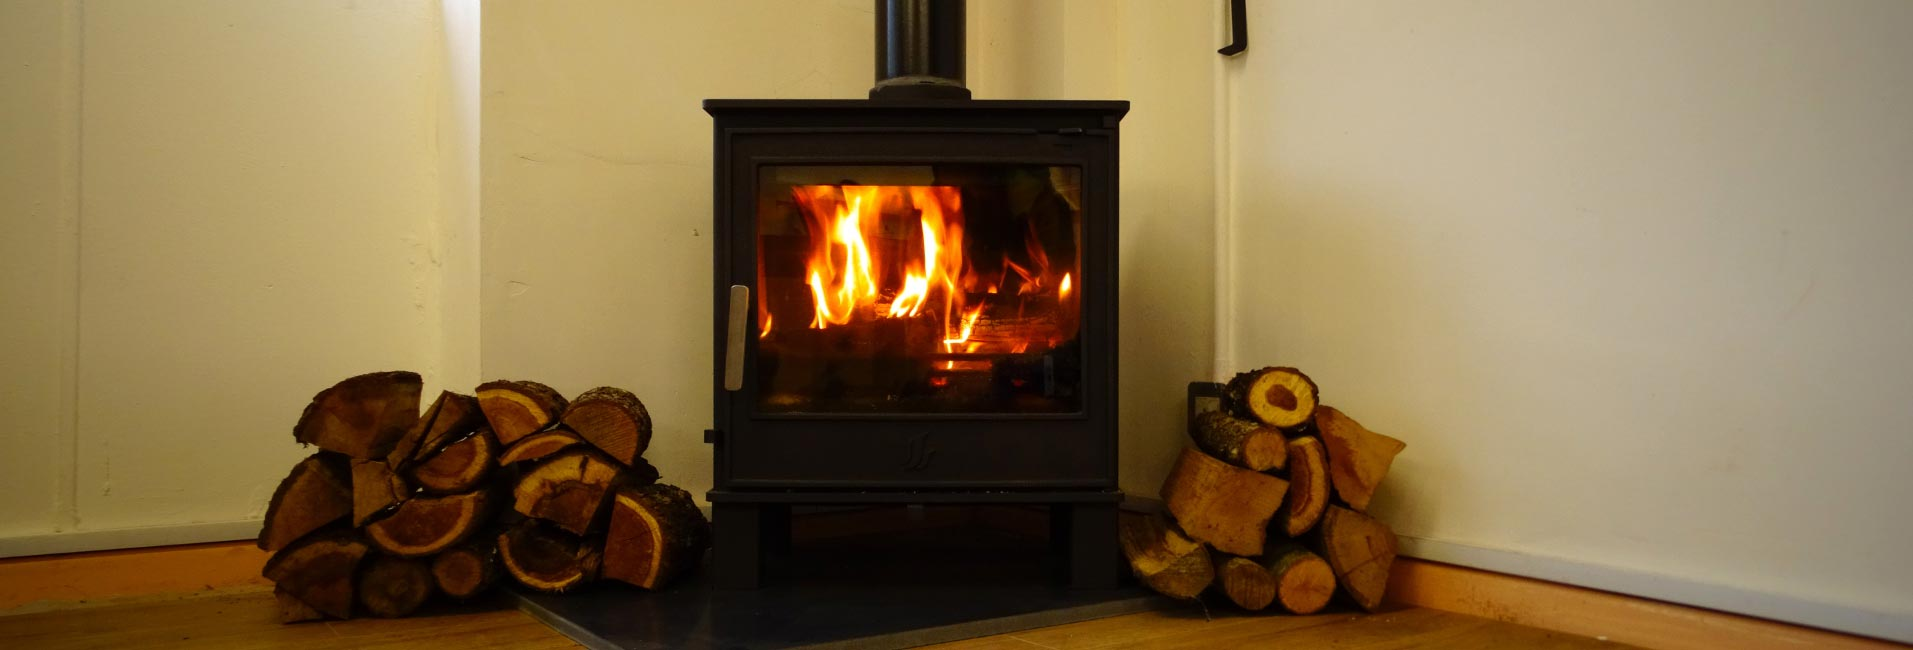 Logs For Wood Burning Stoves Sheffield